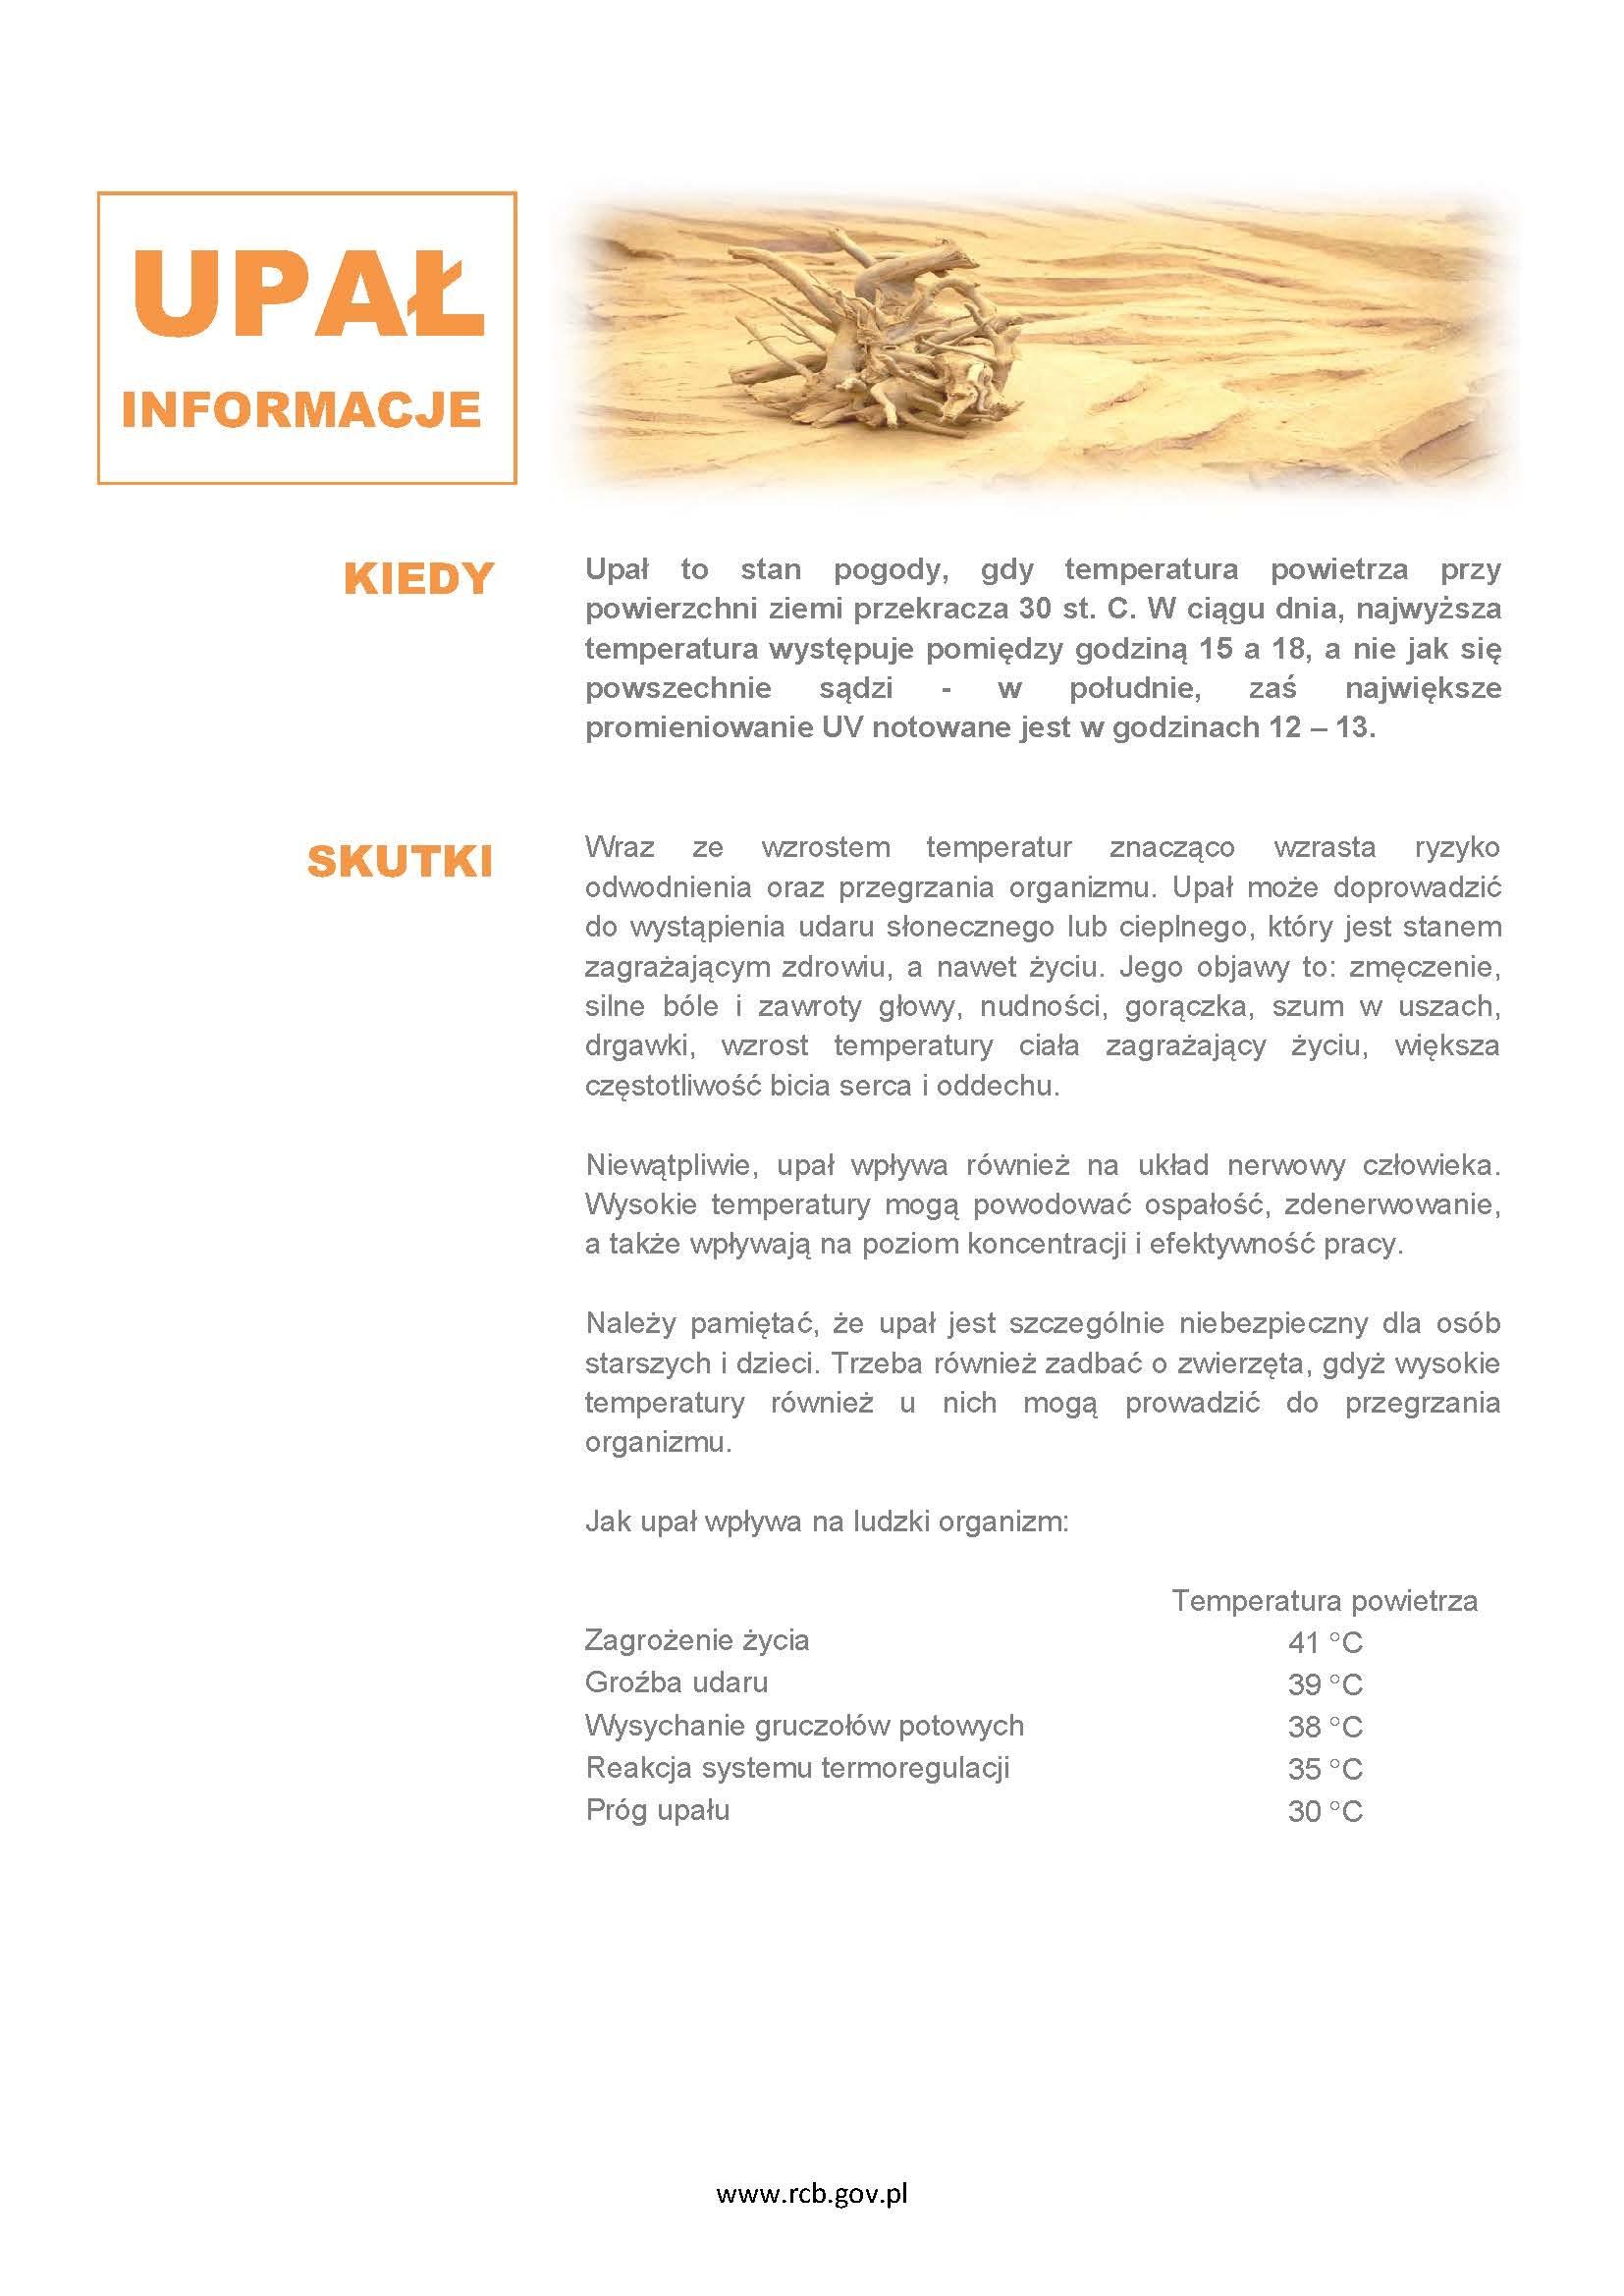 upal-poradnik_strona_2.jpg